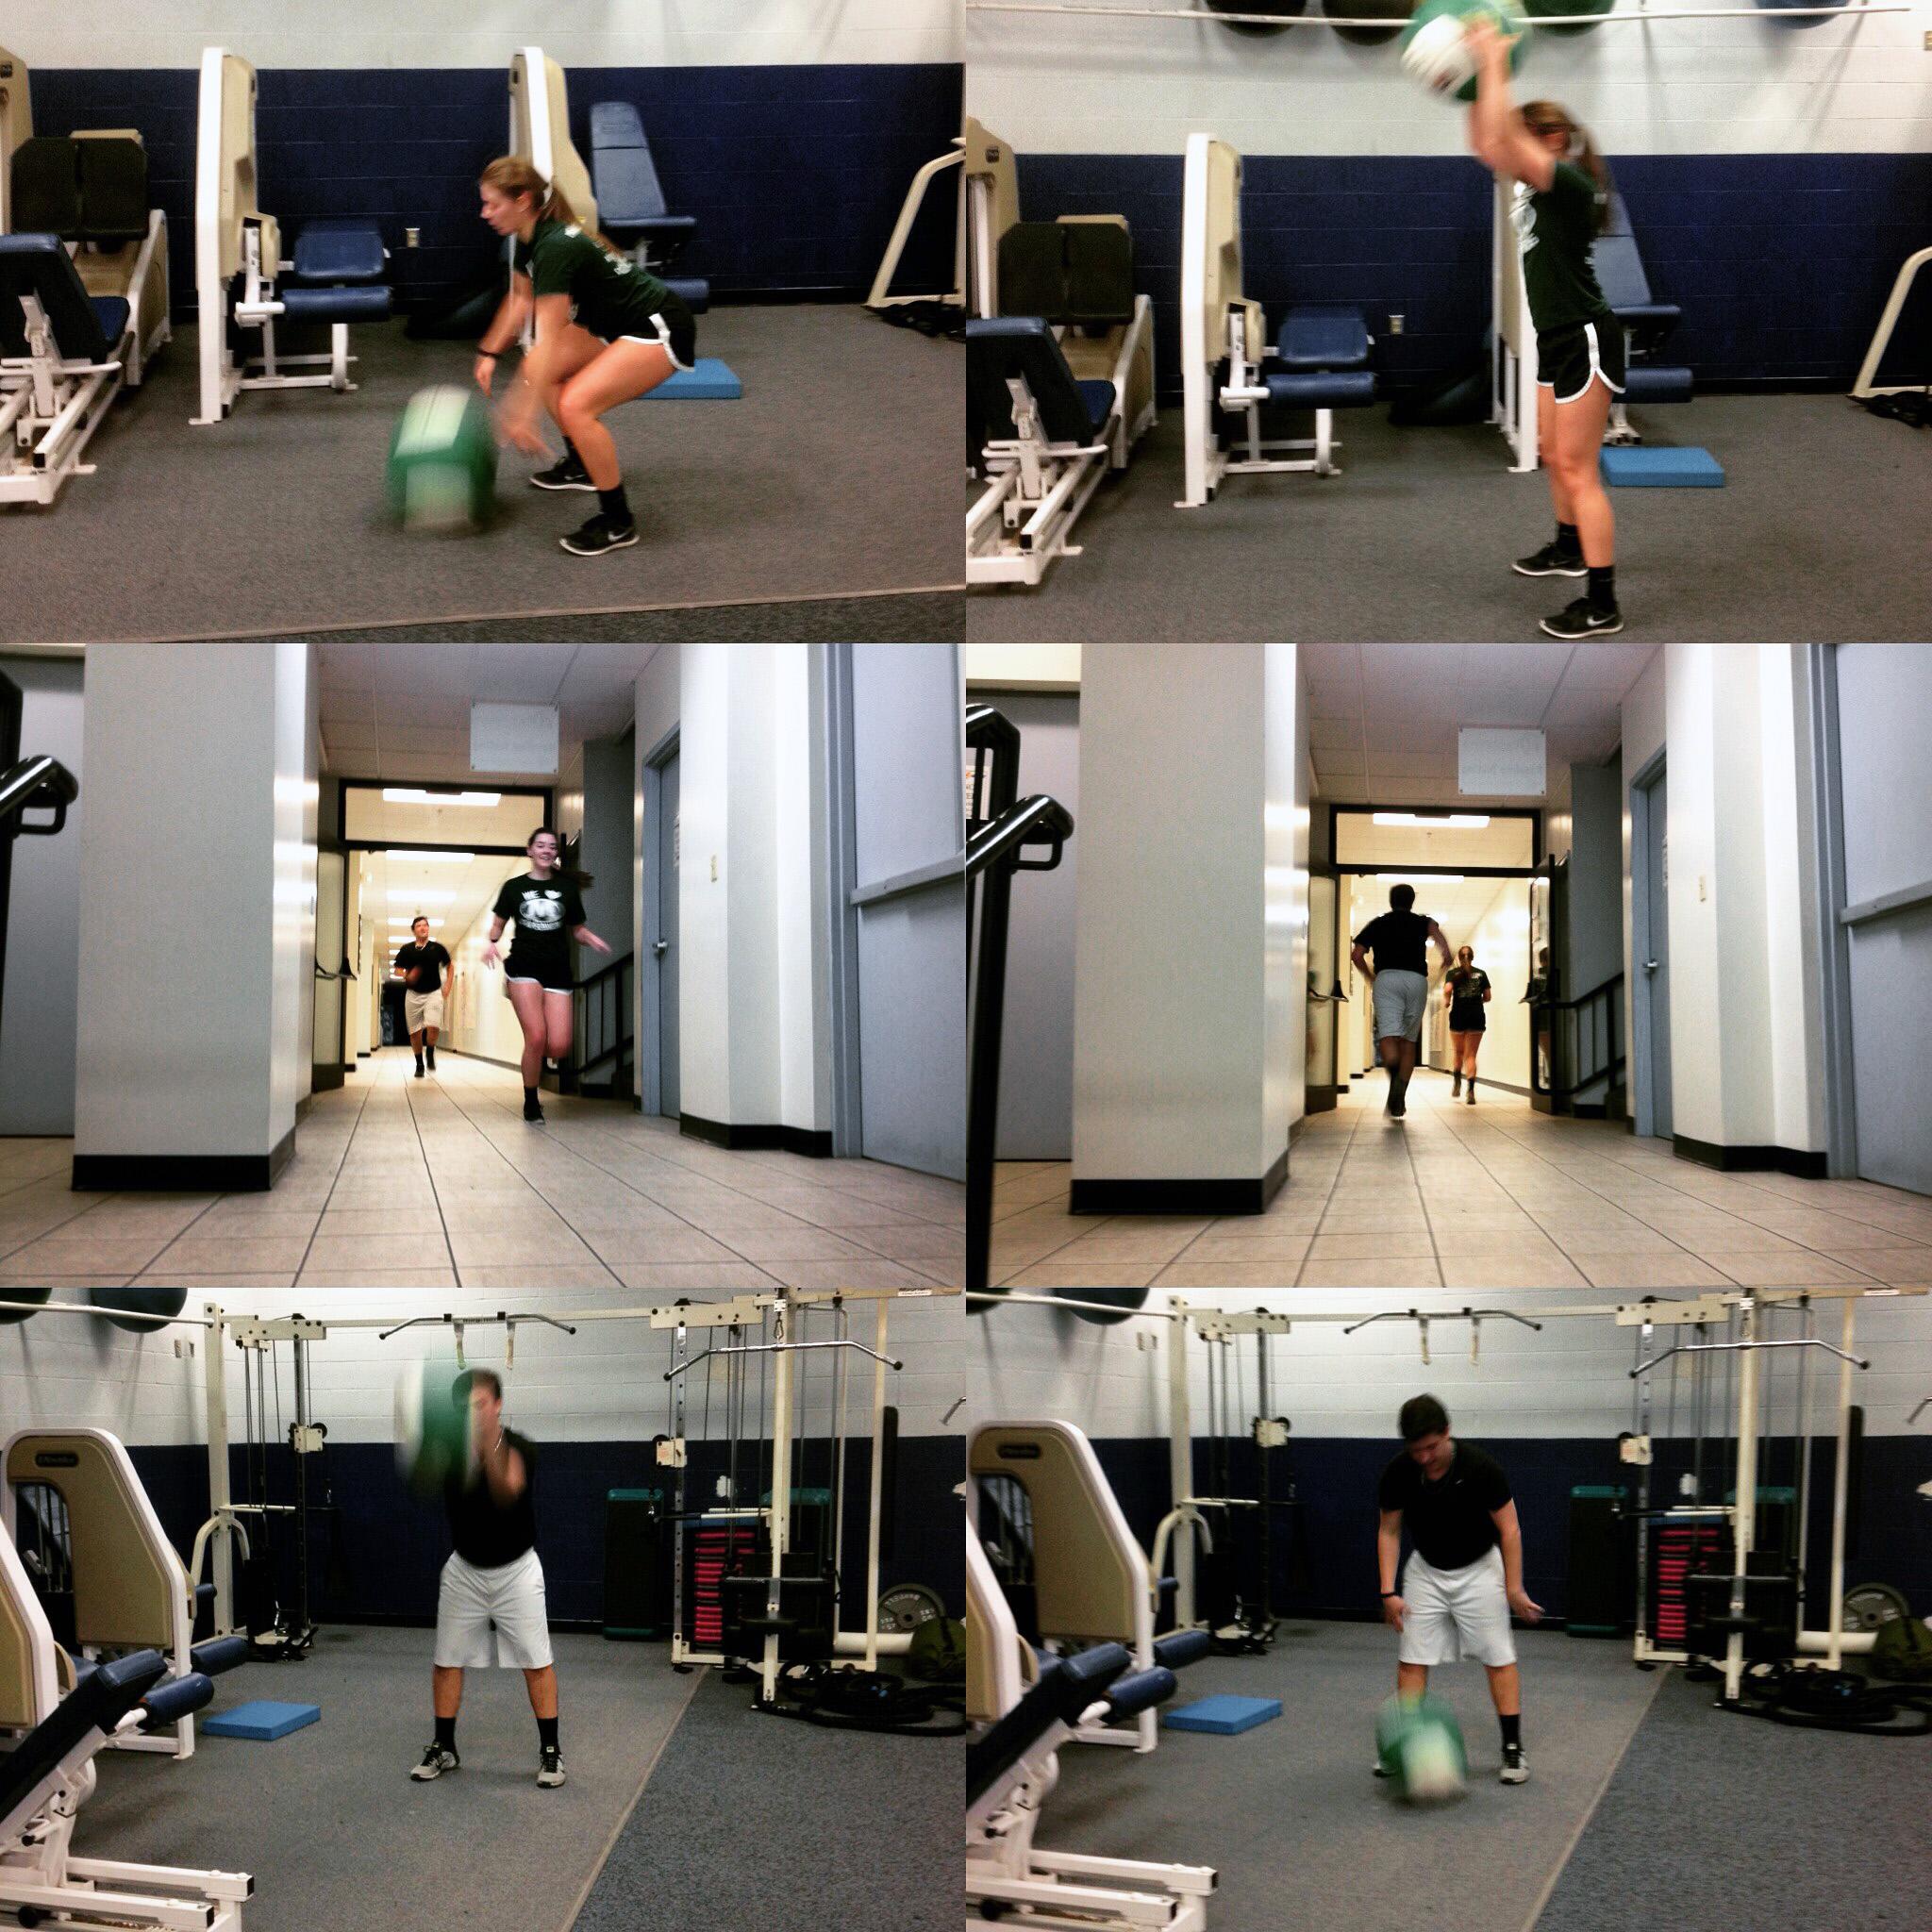 fitness, sports performance training, personal training, speed training, strength training, weightlifting, pinnacle performance, pinnacle sports, medina, ohio